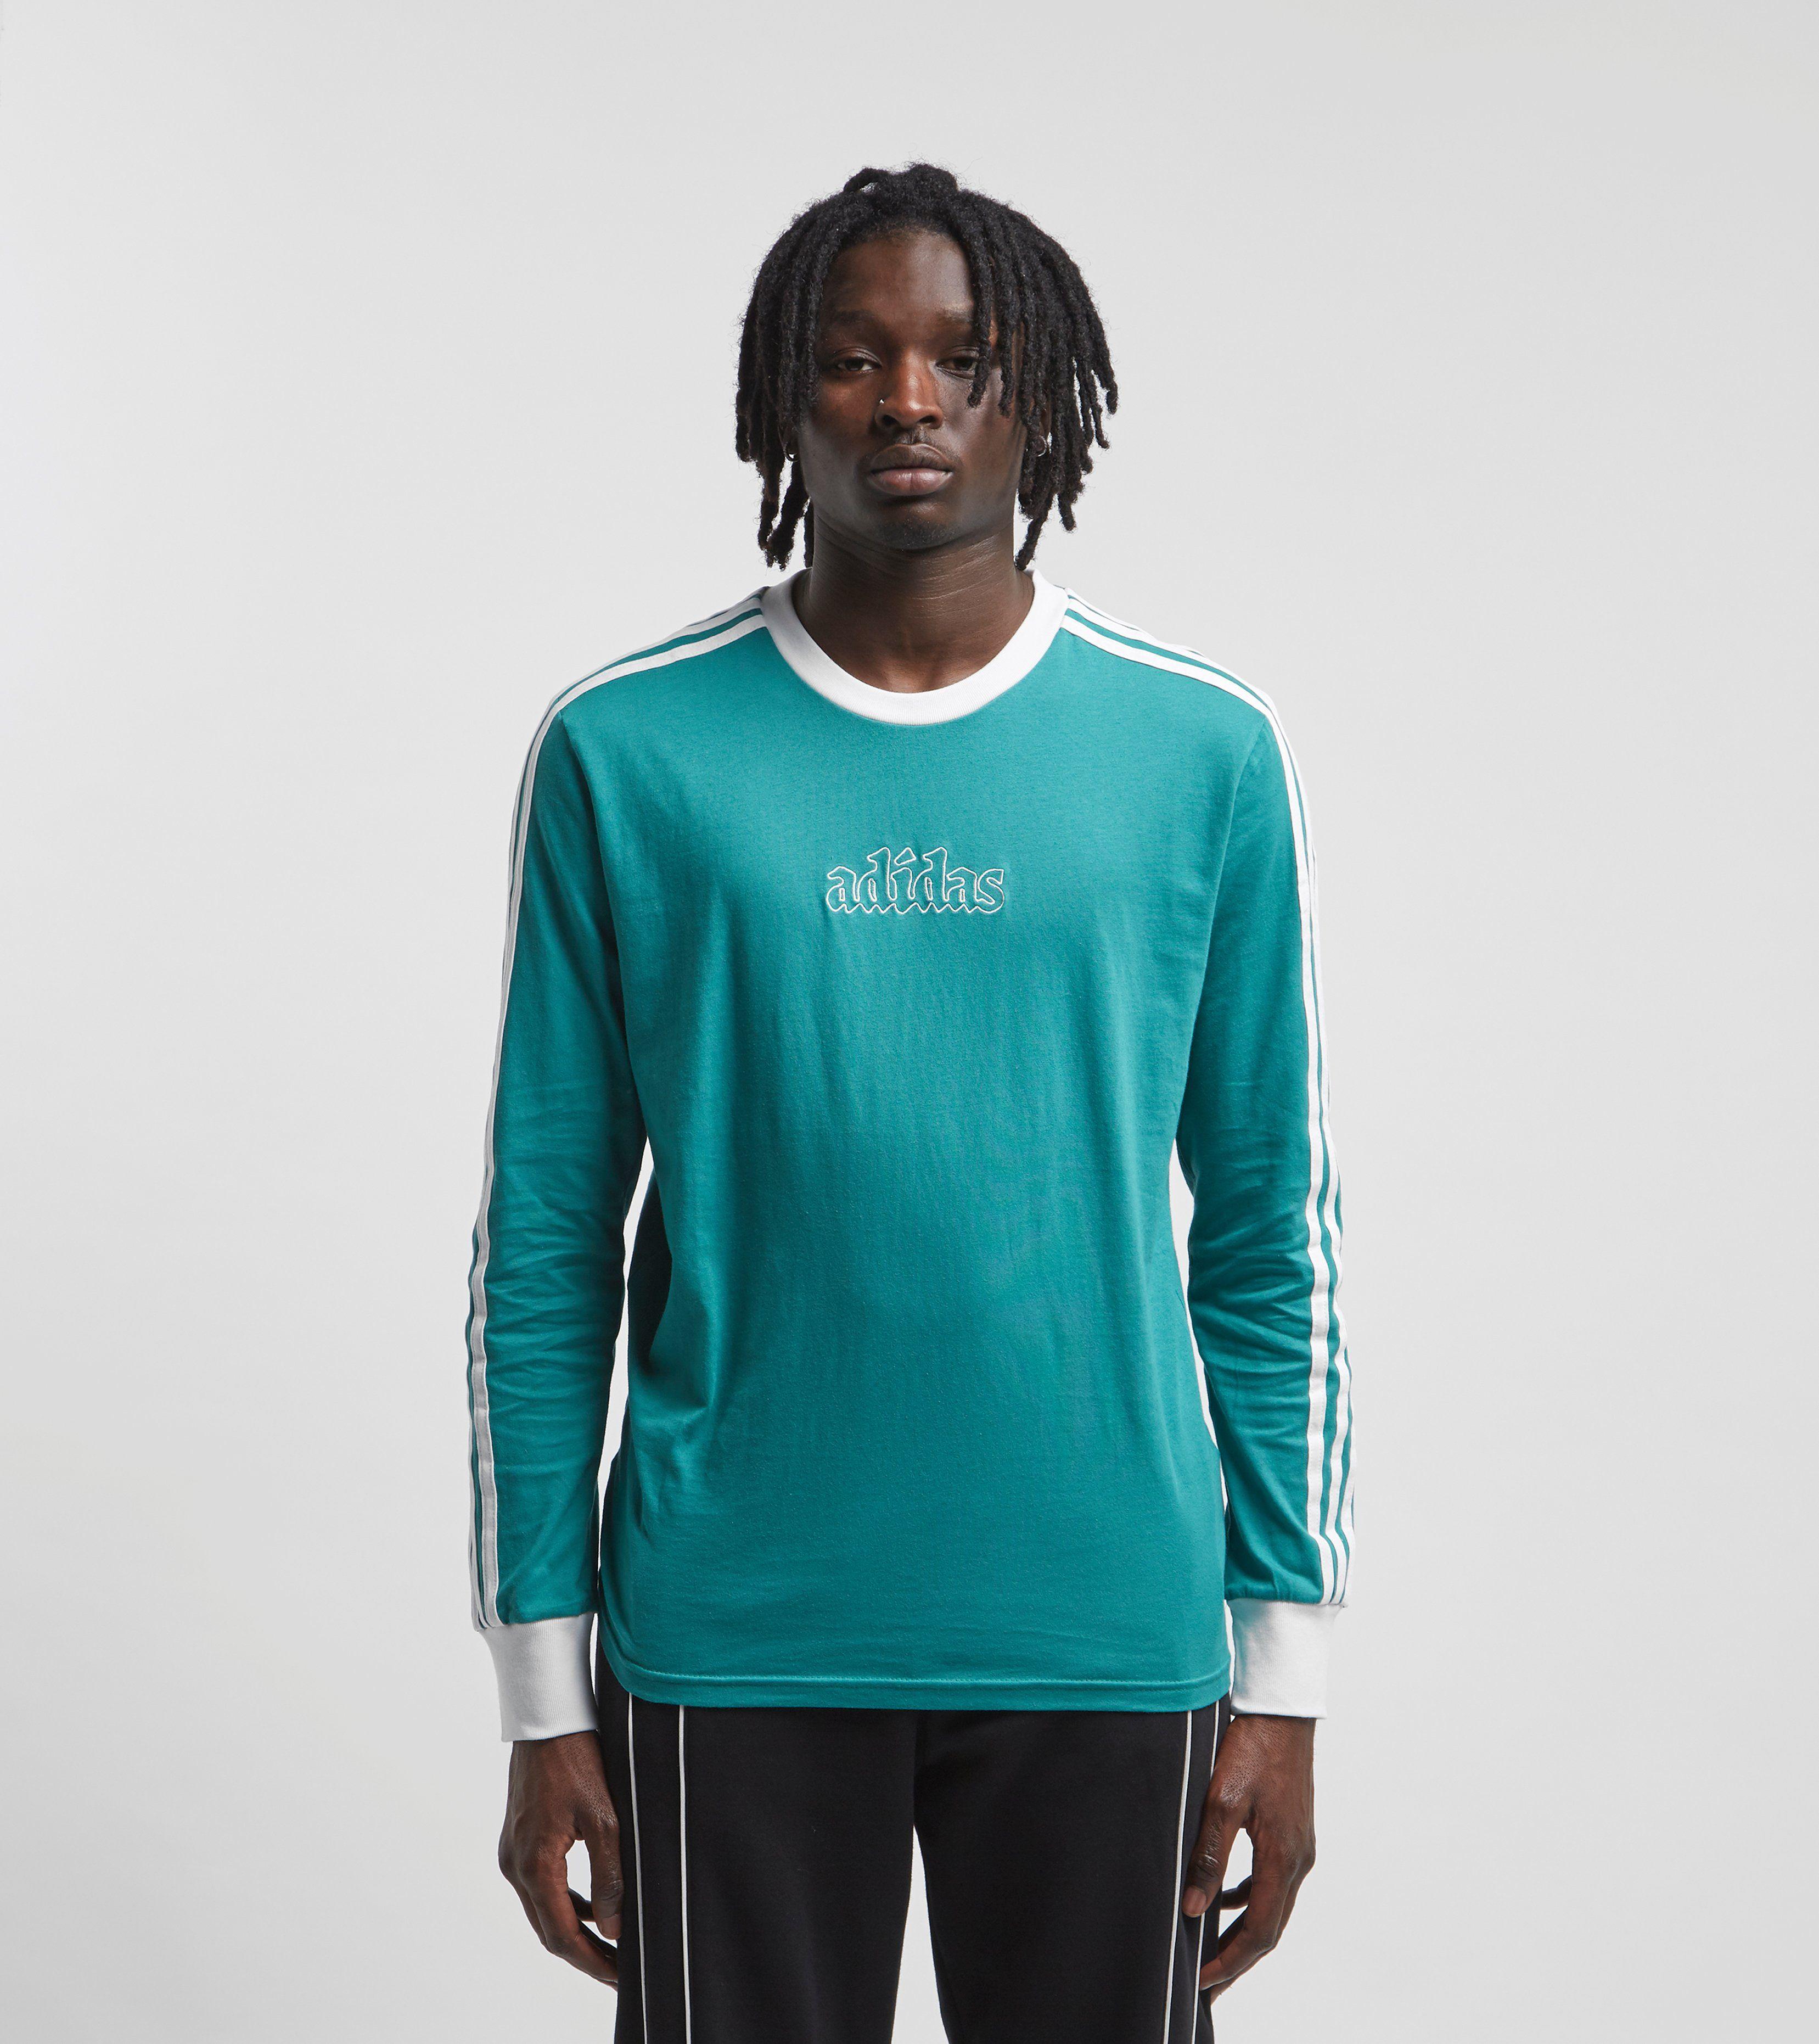 adidas Originals Creston Long-Sleeved T-Shirt